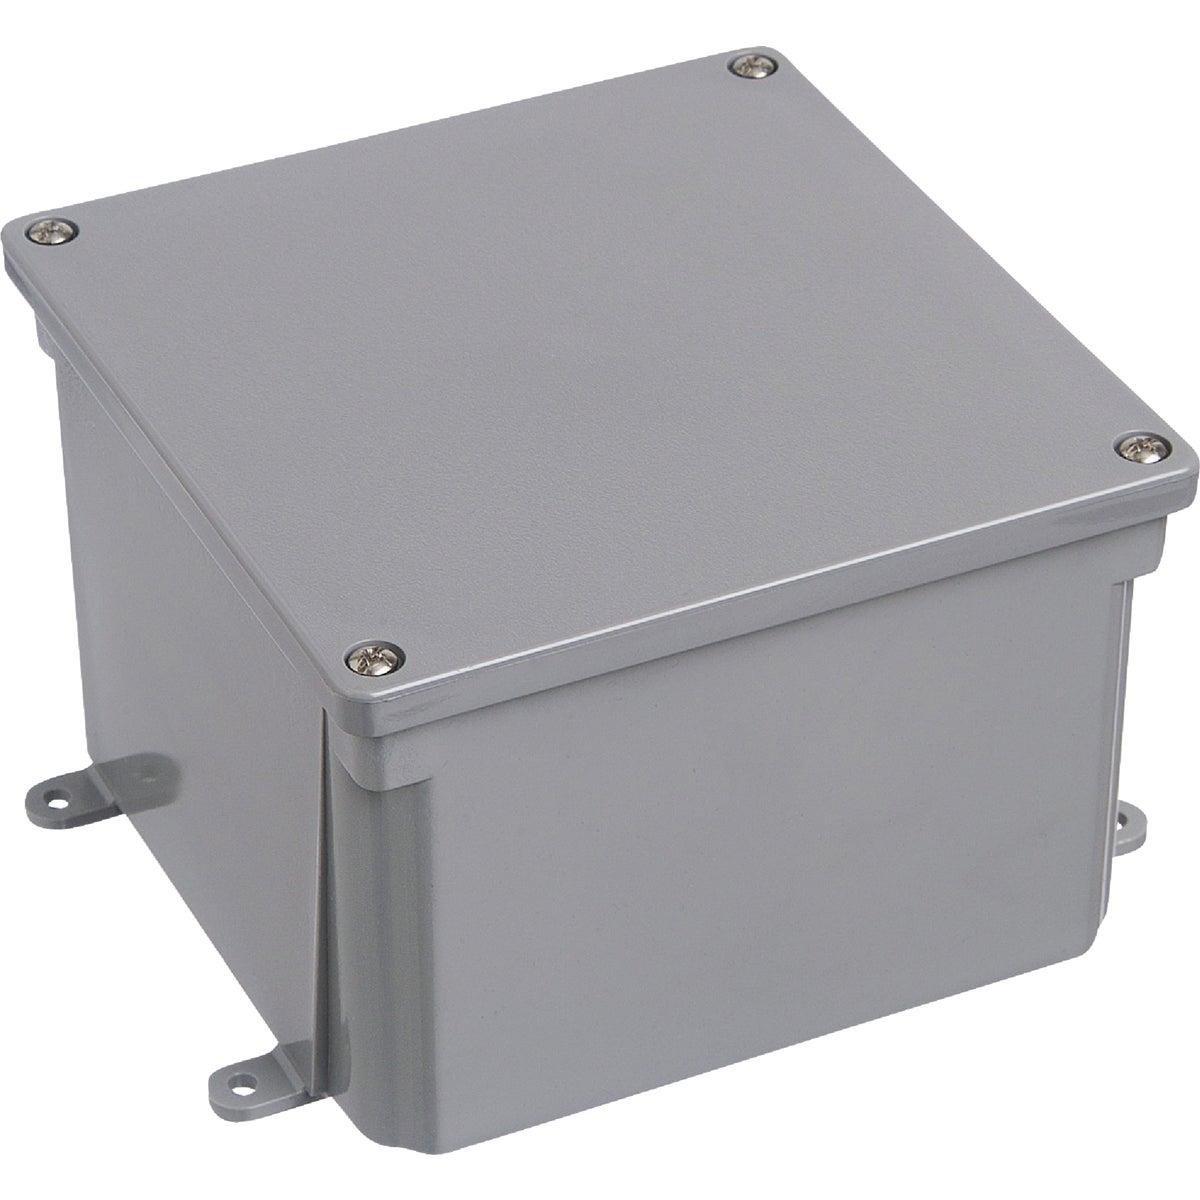 6X6X4 JUNCTION BOX - E987RR by Thomas & Betts